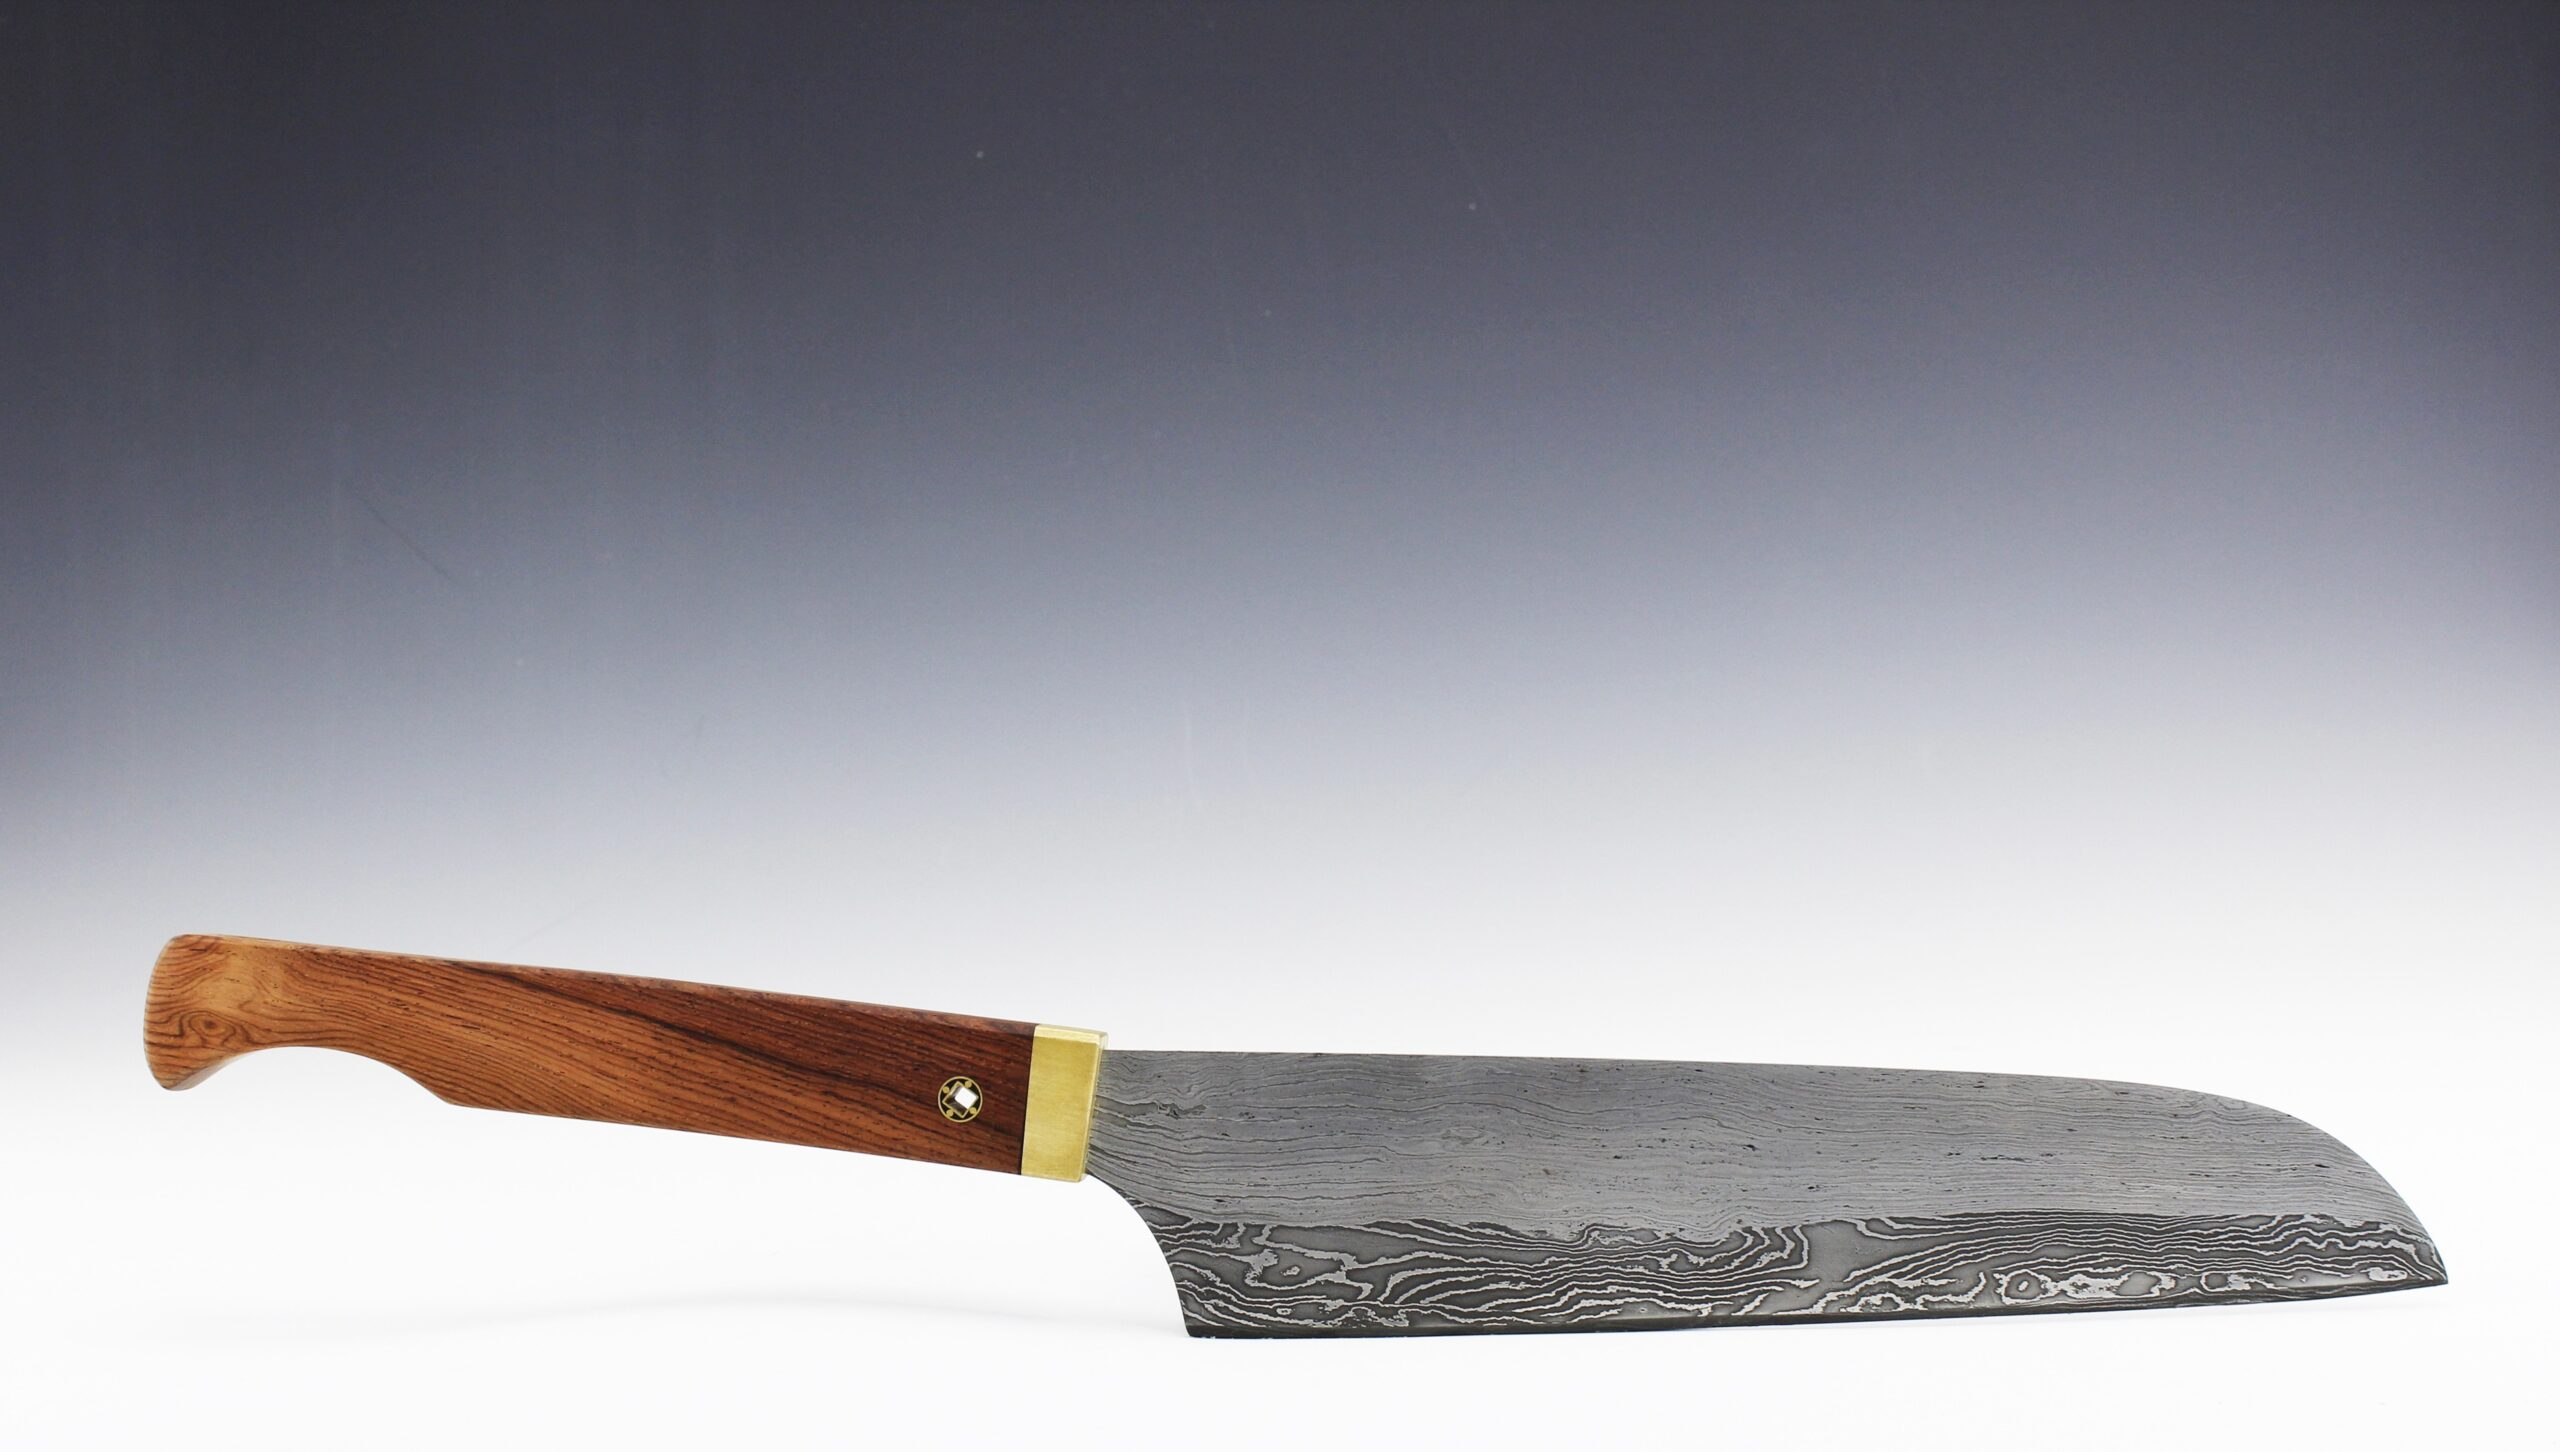 Hand forged pattern welded santoku